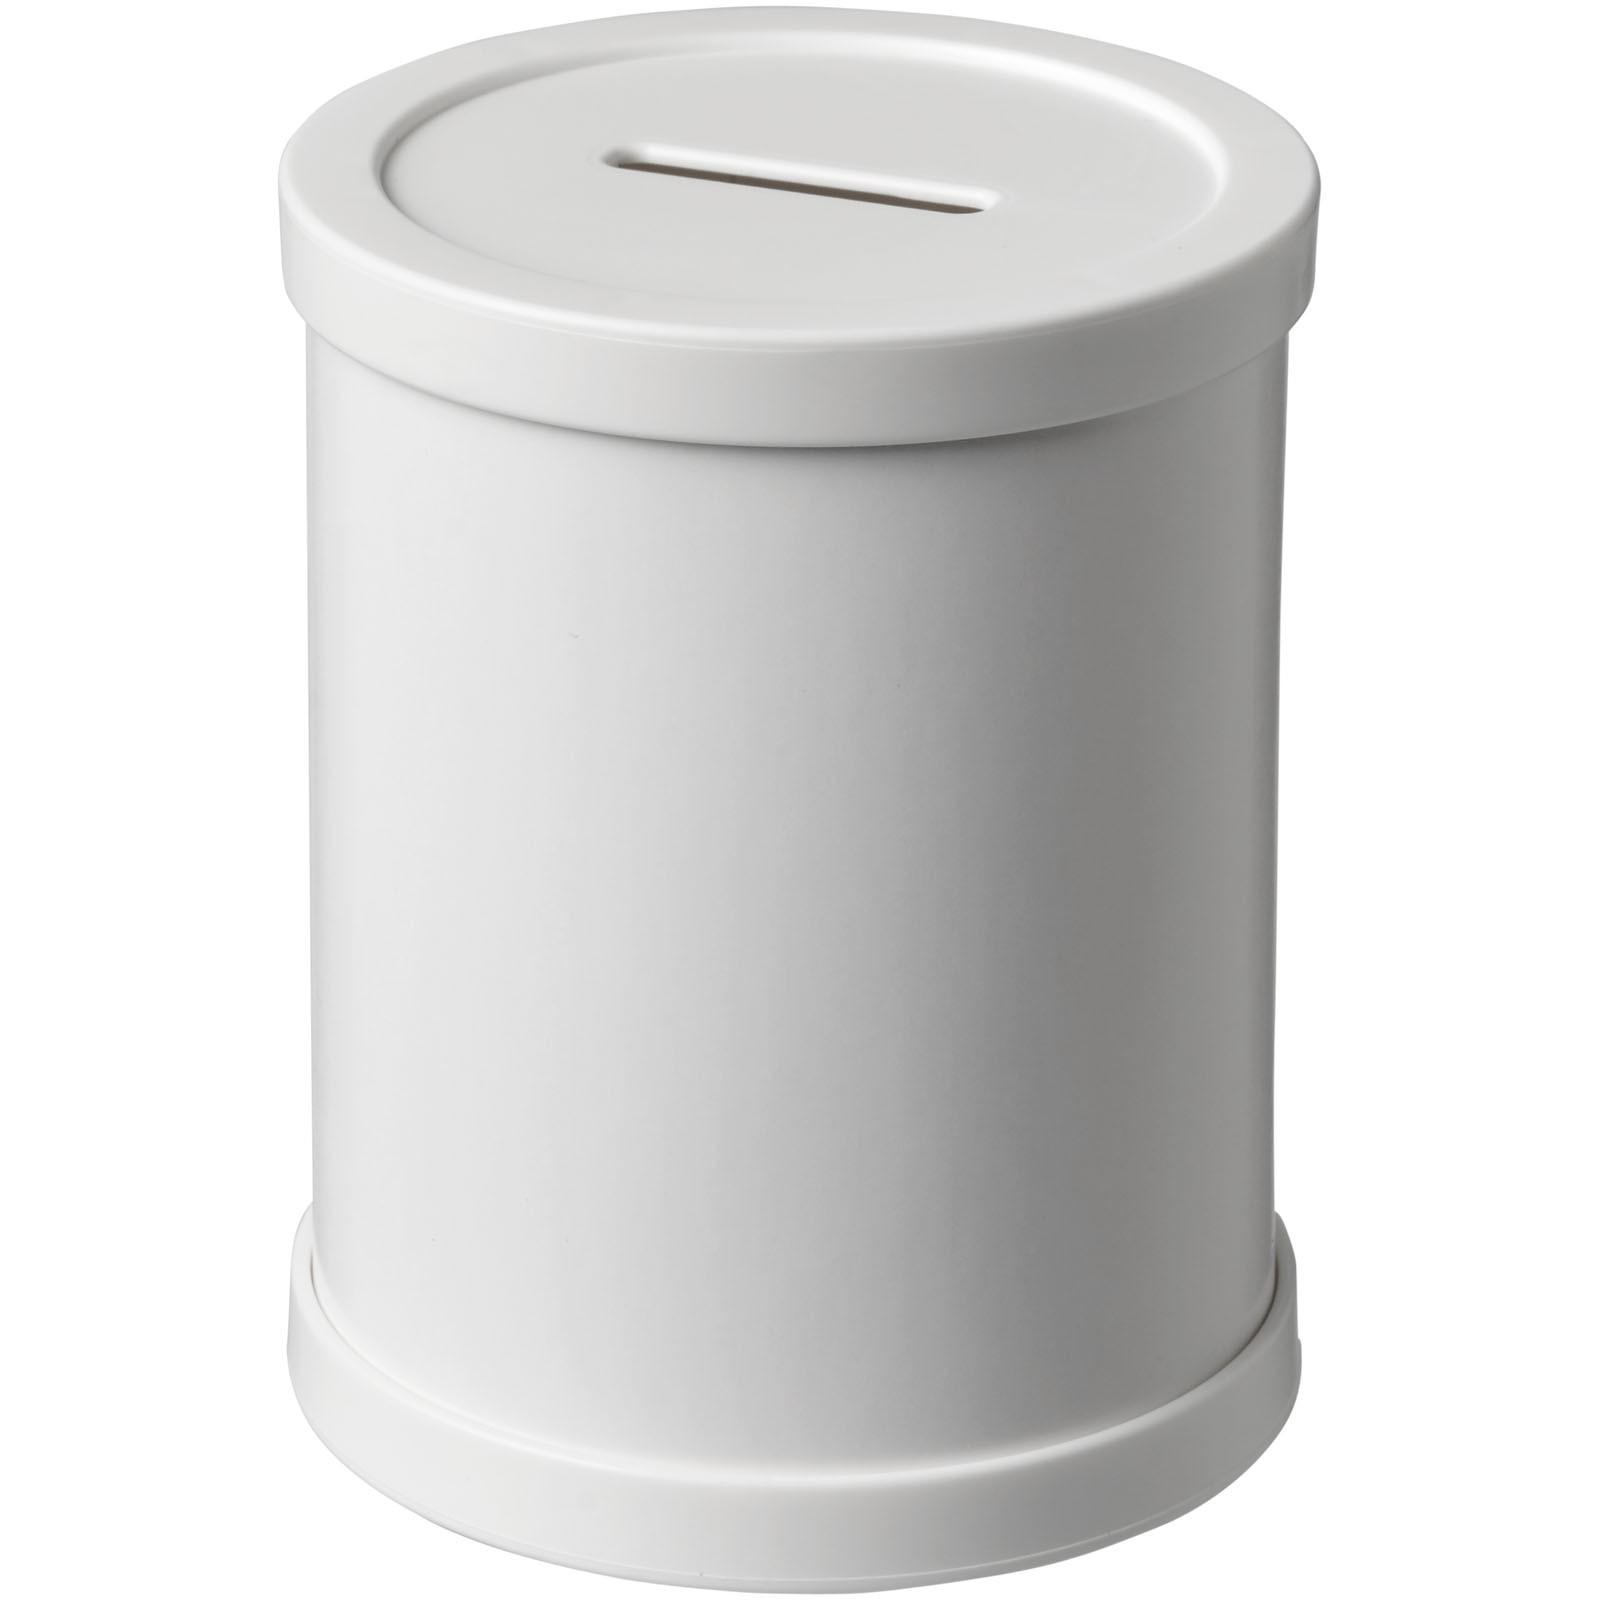 Rafi round money container - White